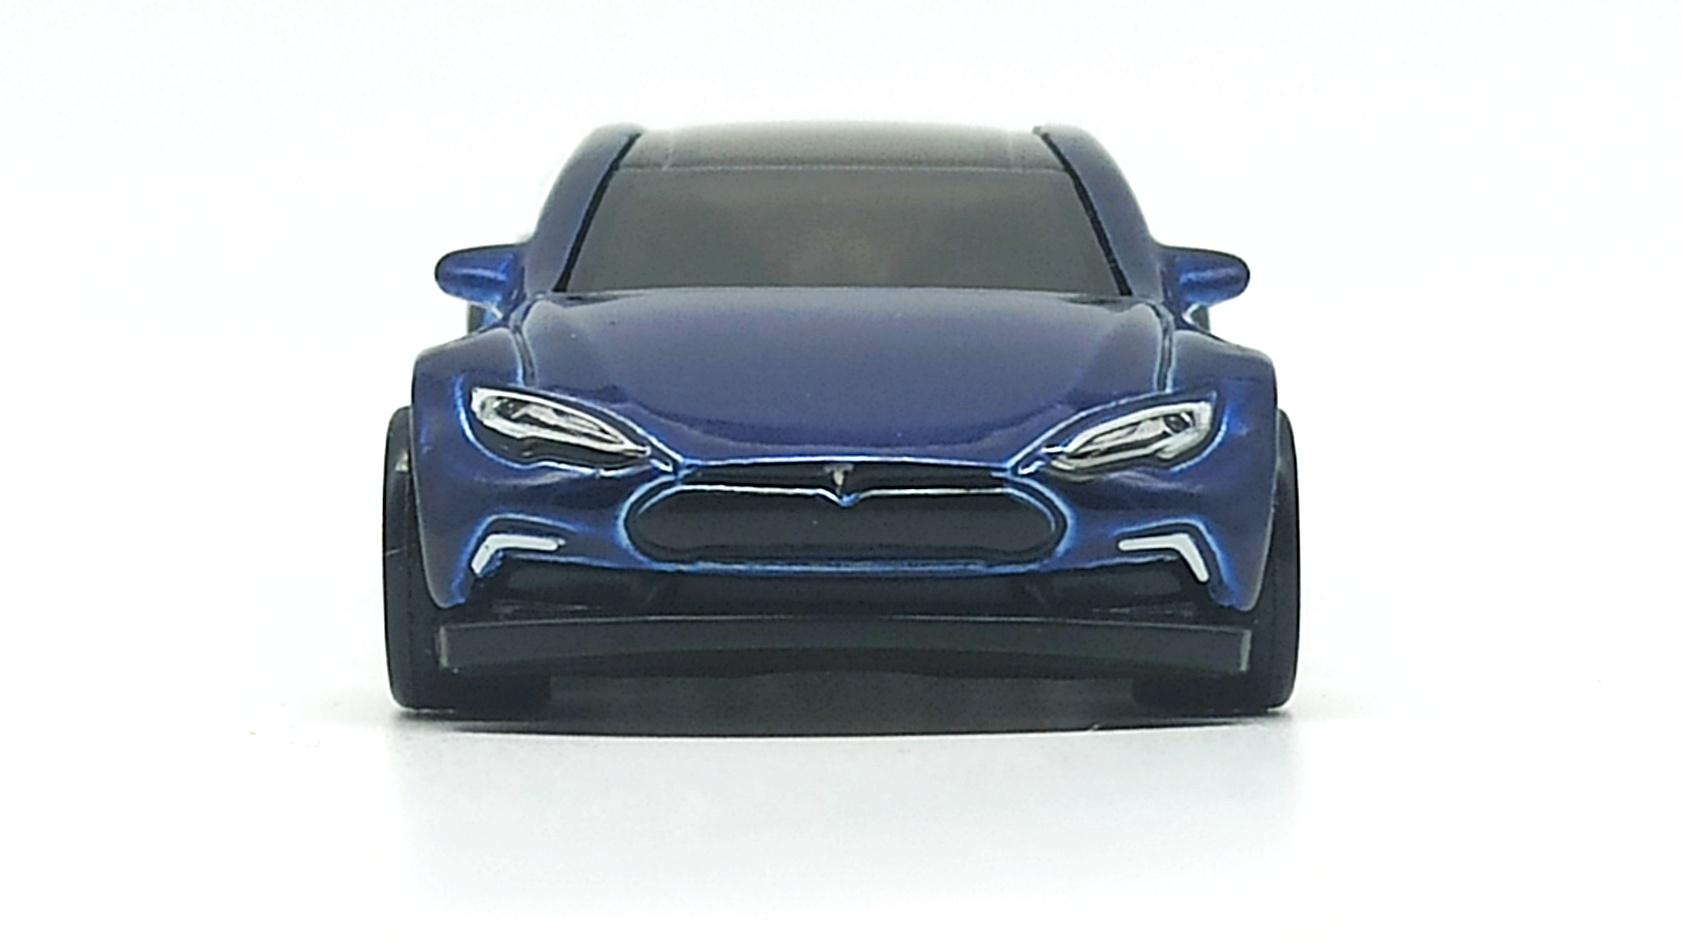 Hot Wheels Tesla Model S (FYG08) 2019 (226/250) HW Green Speed (4/5) indigo blue Super Treasure Hunt (STH) front